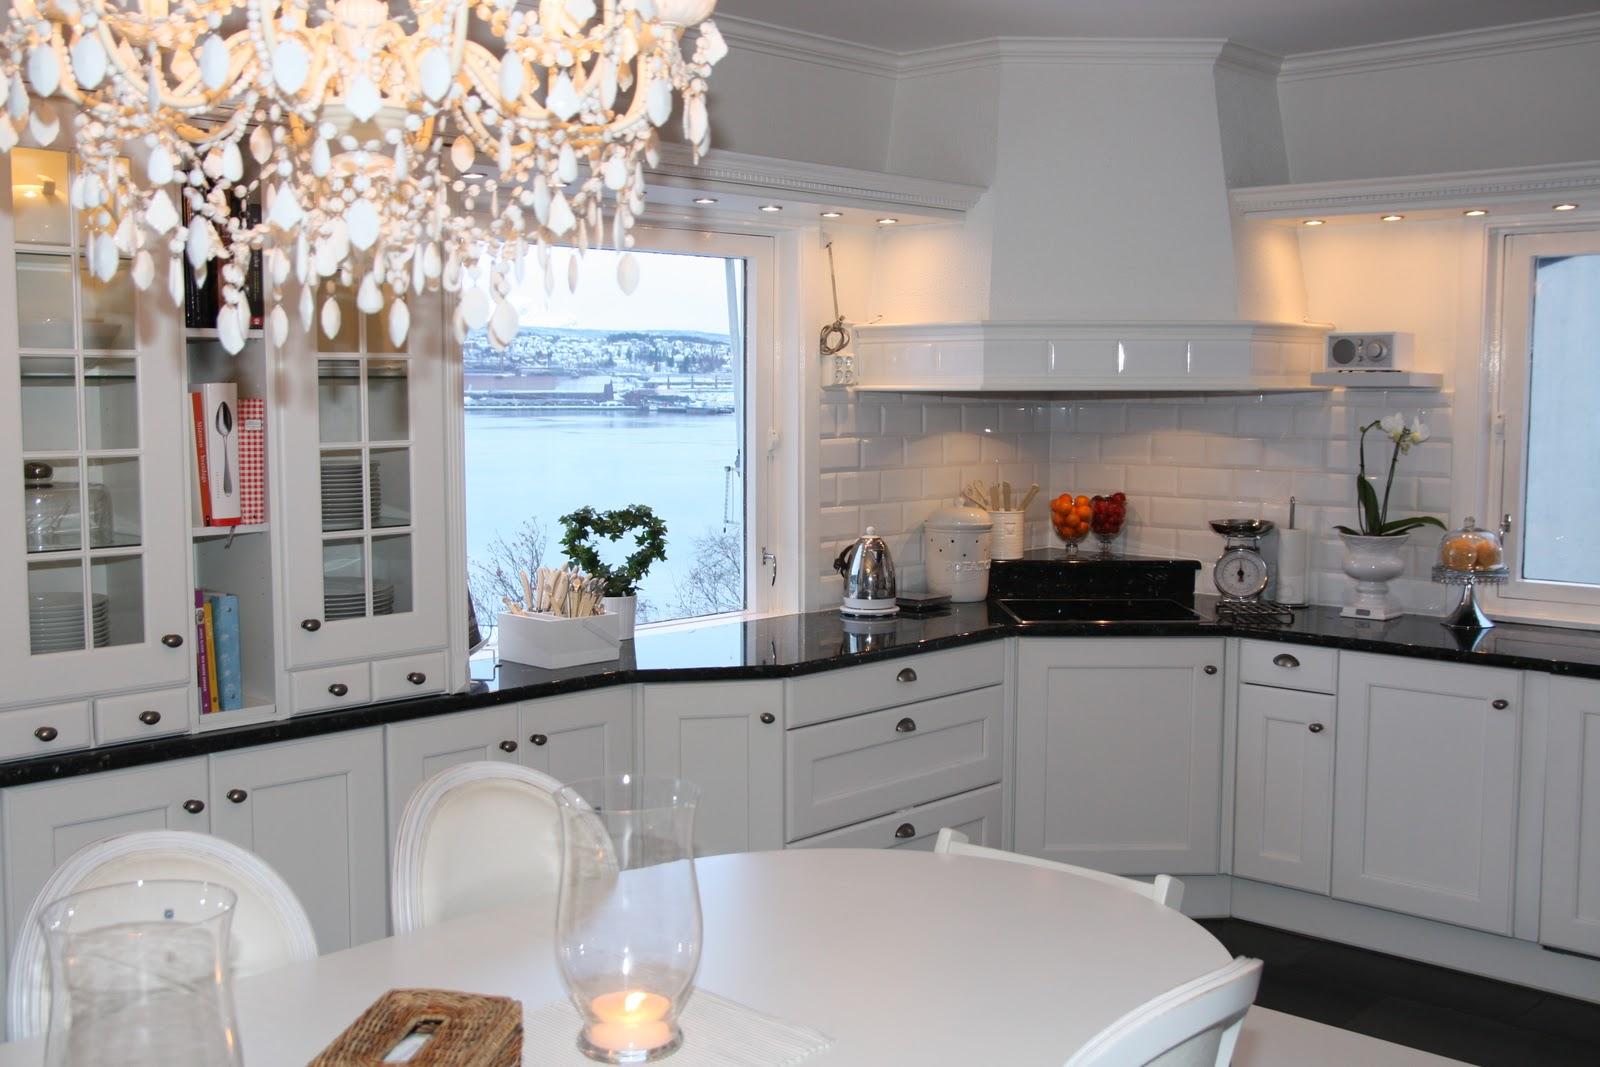 Spraylakkere kjøkken bergen – La réparation des appartements